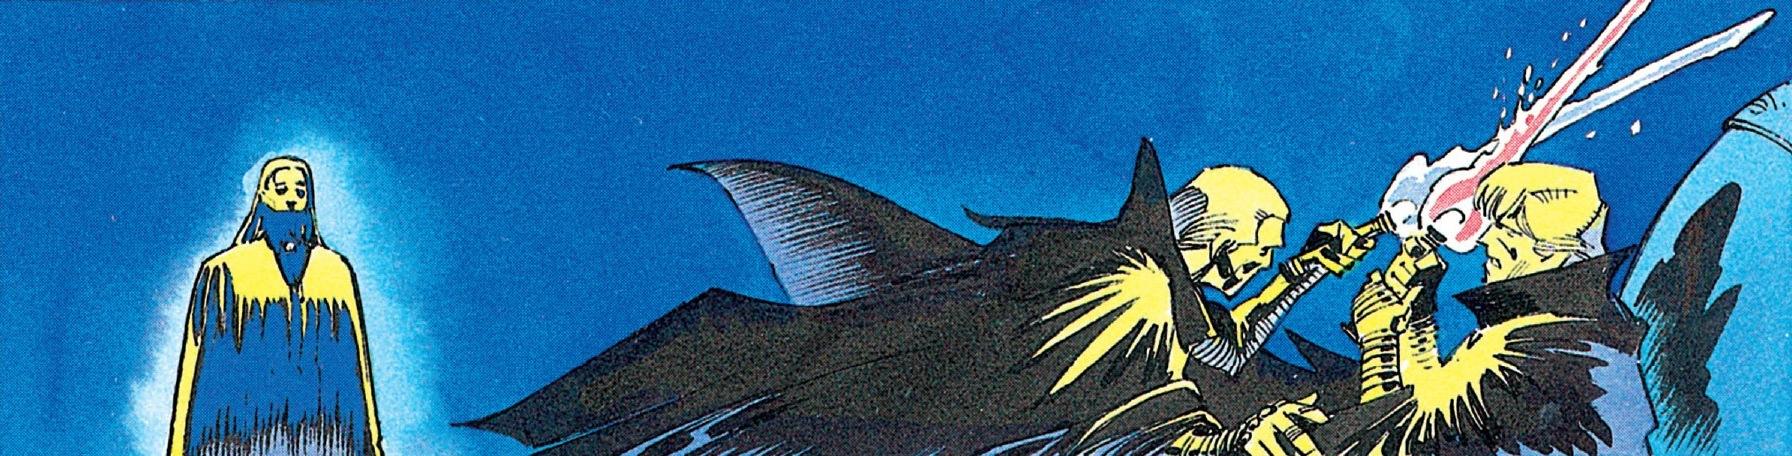 Palpatine's blue-bladed lightsaber